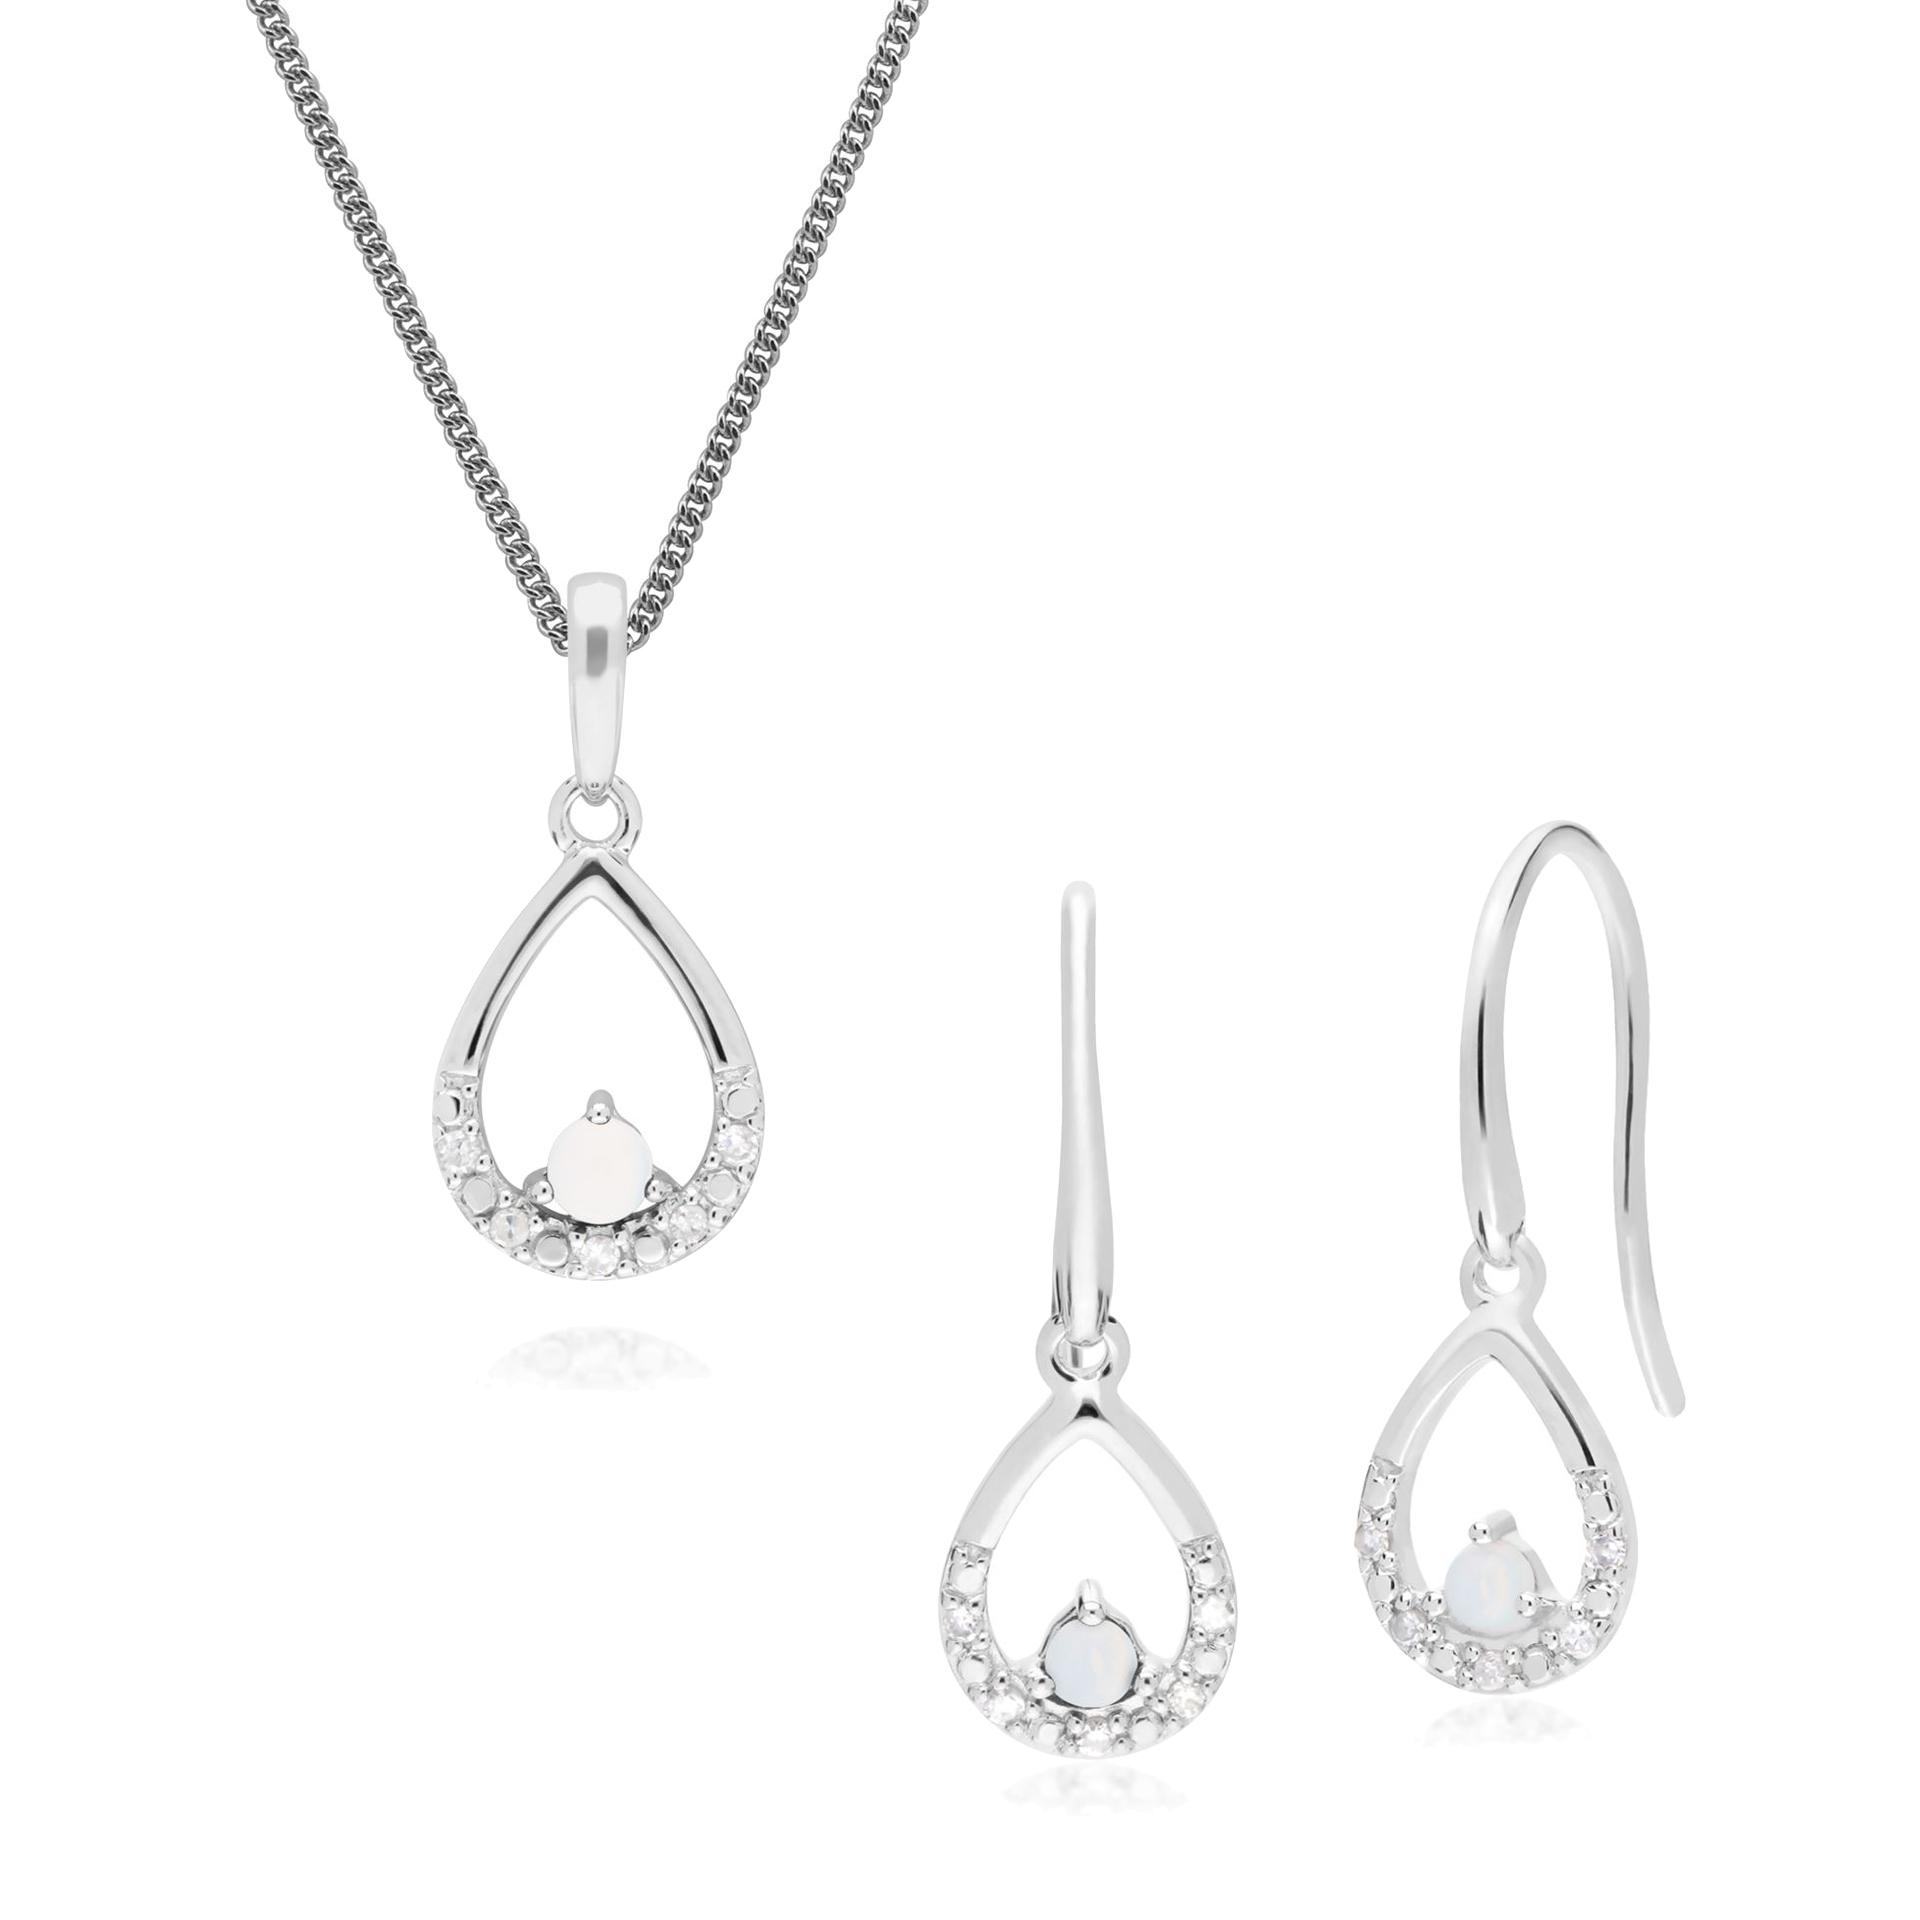 b54fefeb2 Details about 9ct White Gold Opal & Diamond Pear Drop Earrings & 45cm  Necklace Set